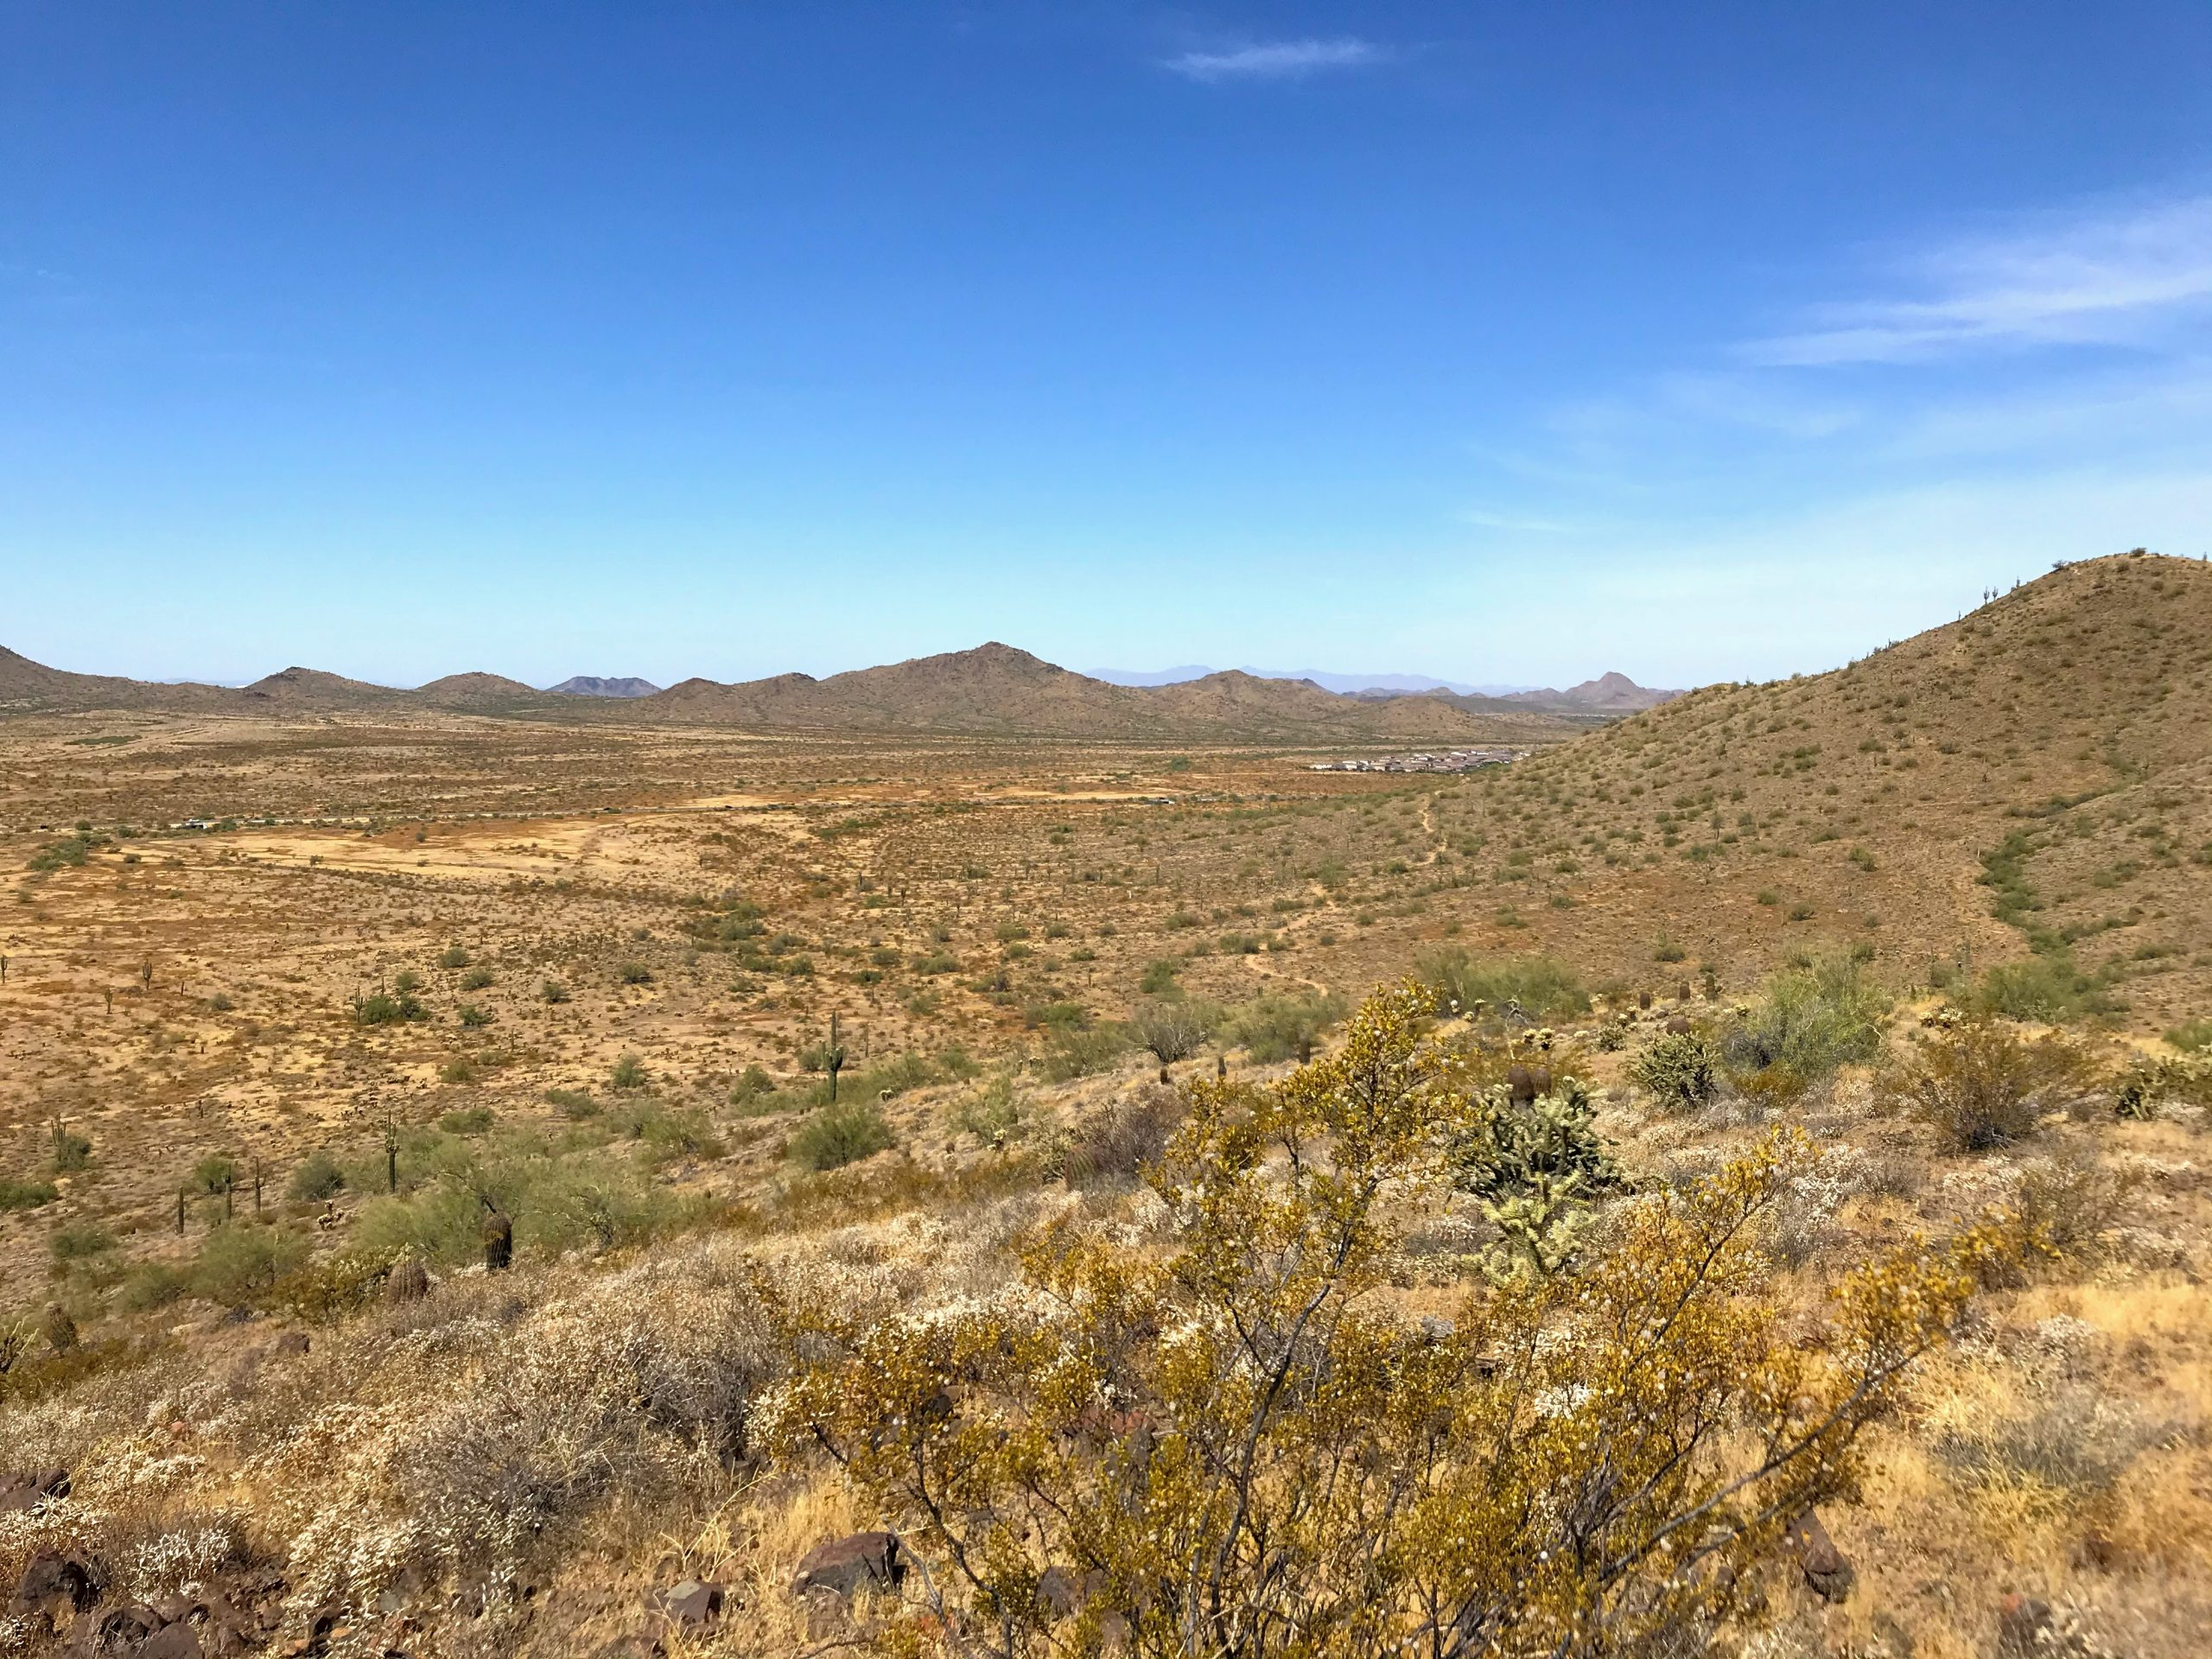 Sidewinder trail hike Phoenix Sonoran Preserve views southeast